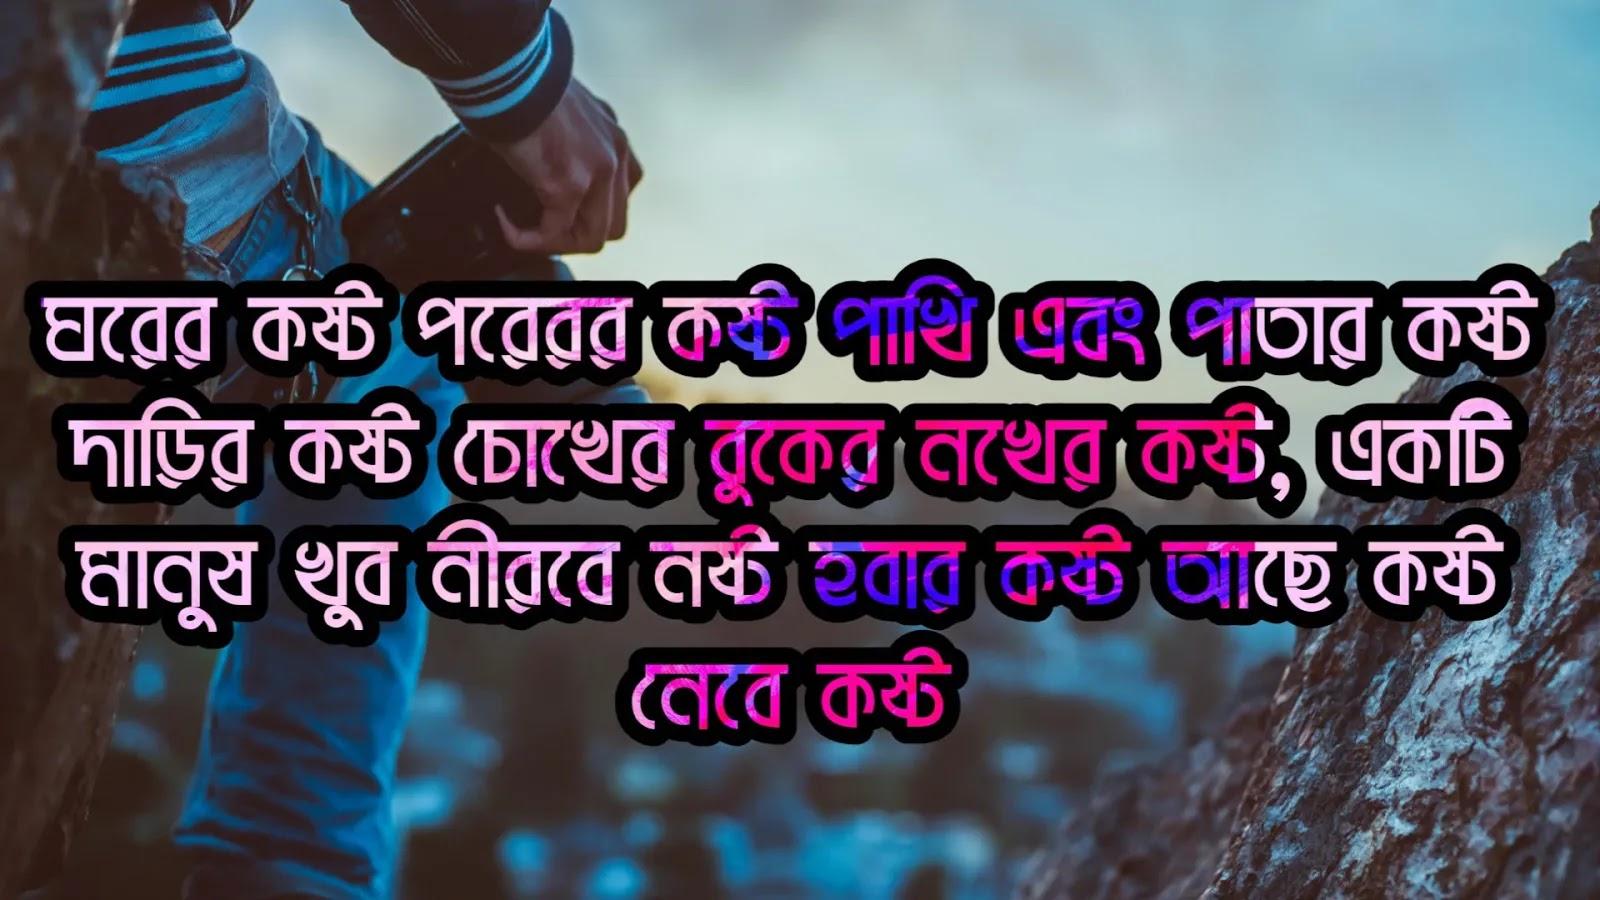 romantic love quotes in bengali download